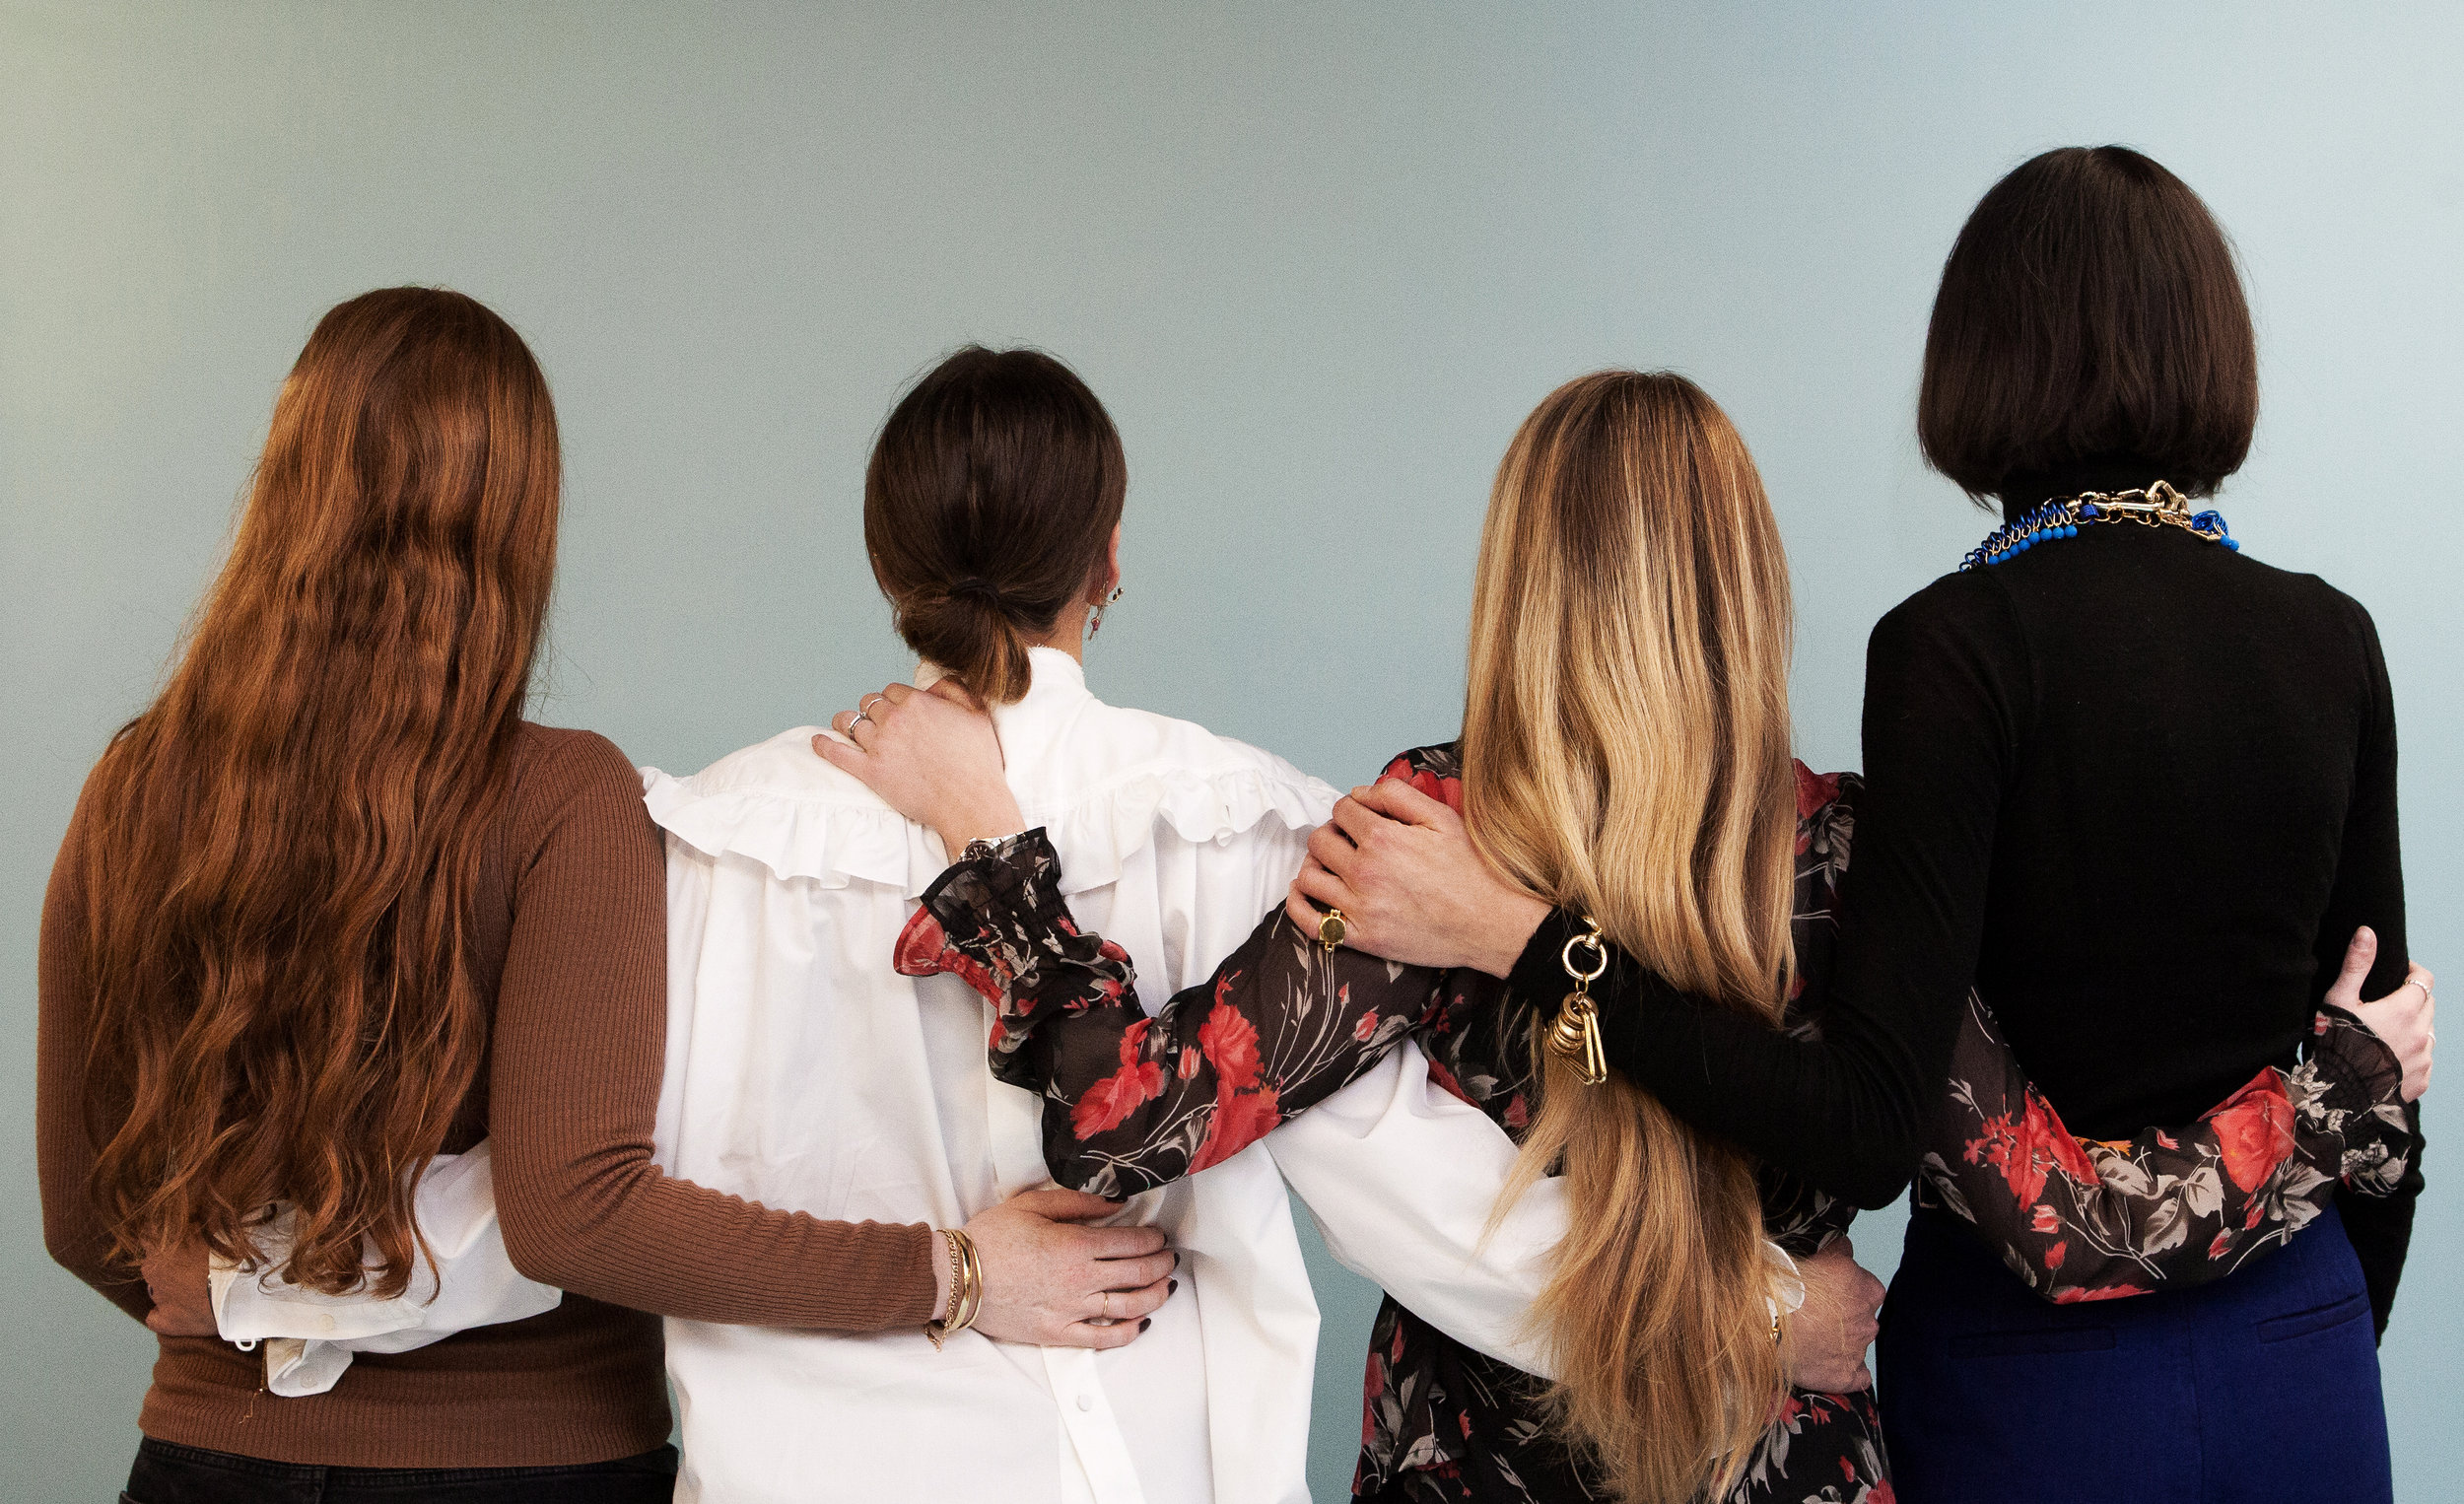 INDEPENDENT WOMEN! - International Womens Day